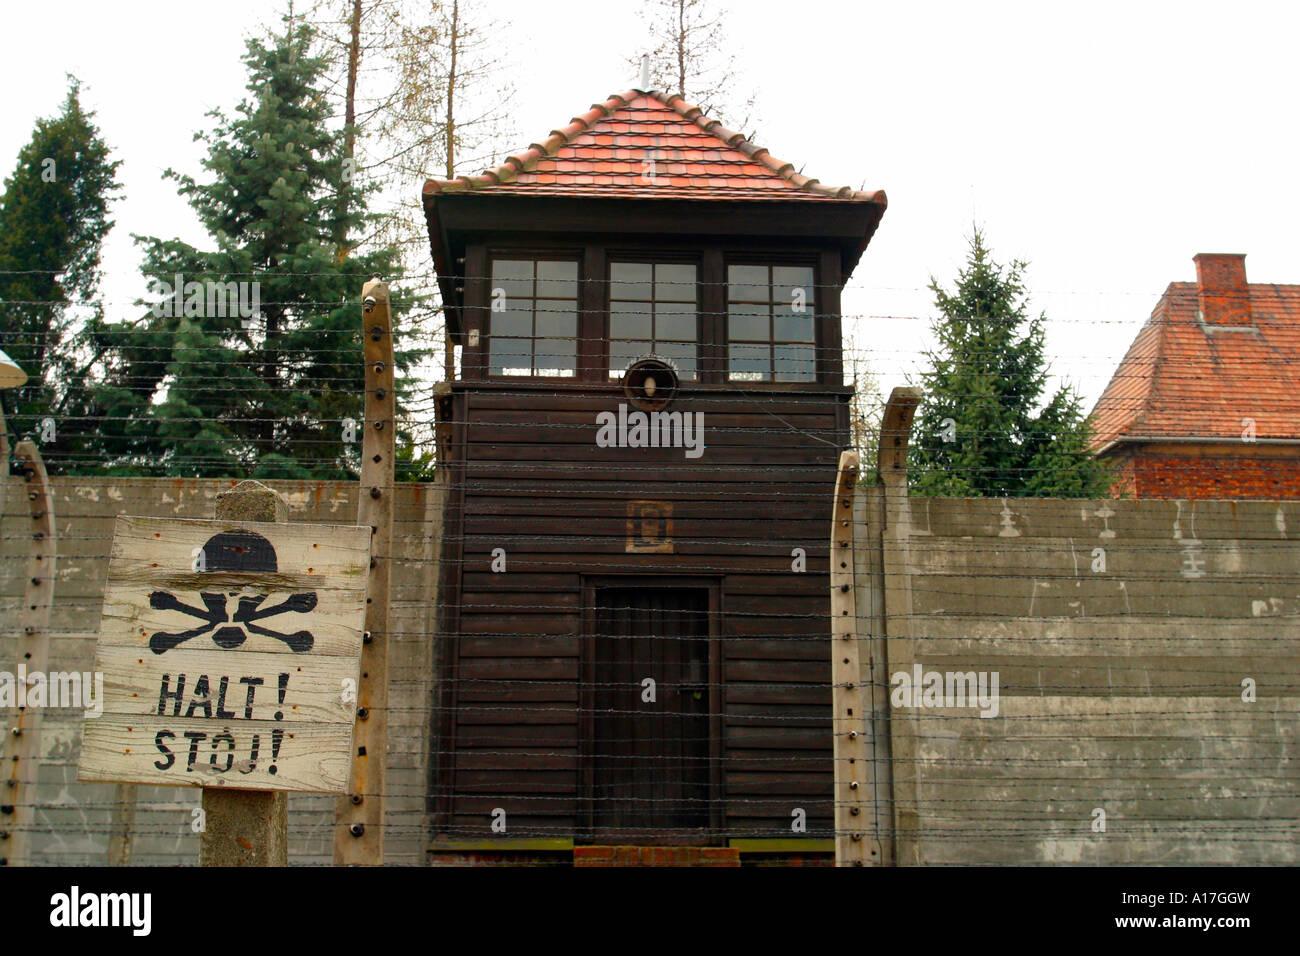 The Auschwitz concentration camp, Oswiecim, Poland. - Stock Image